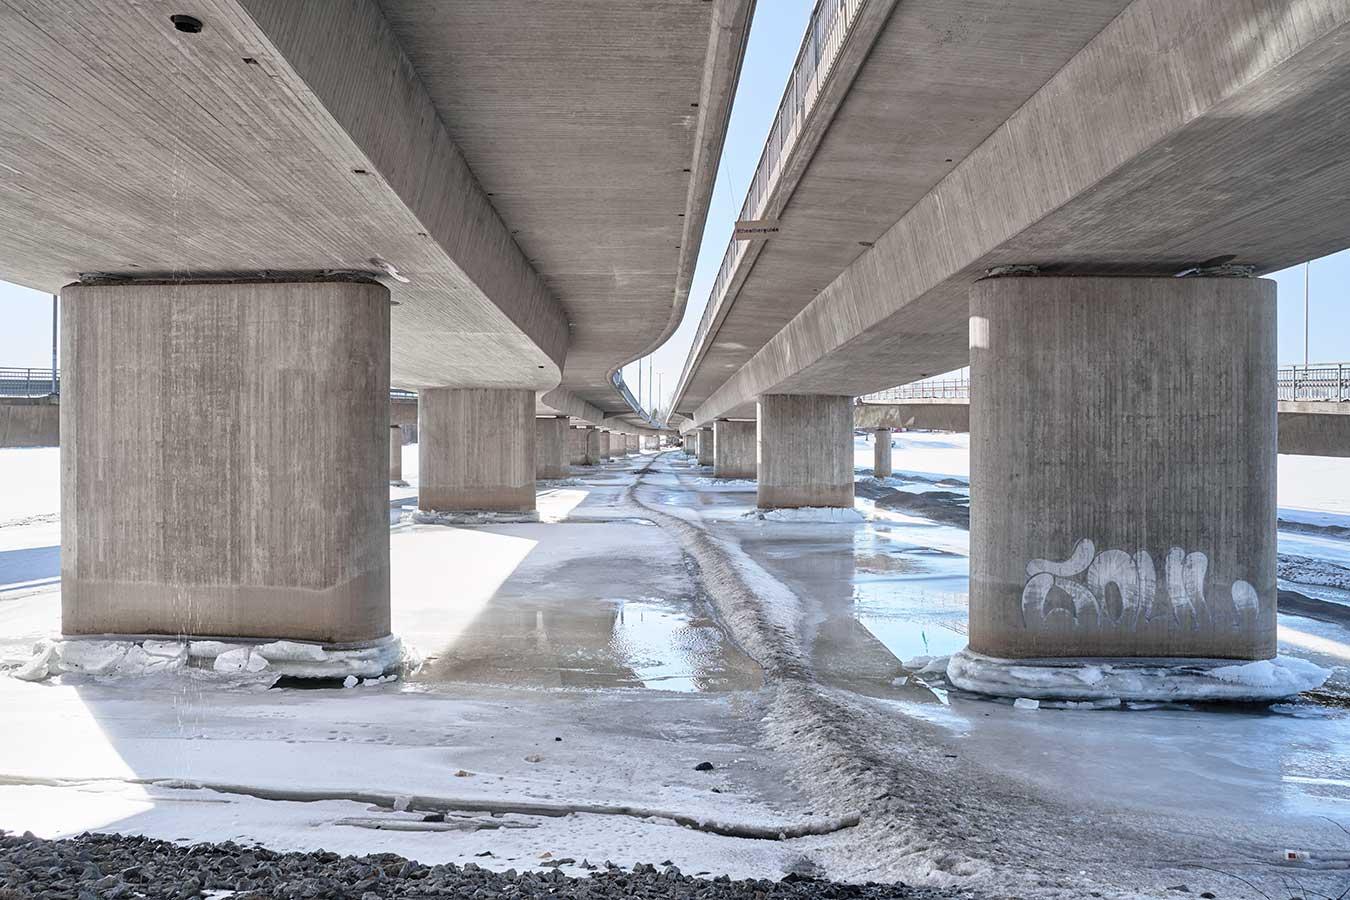 Under The Overpass. Umeå, Sweden by Steve Greenaway